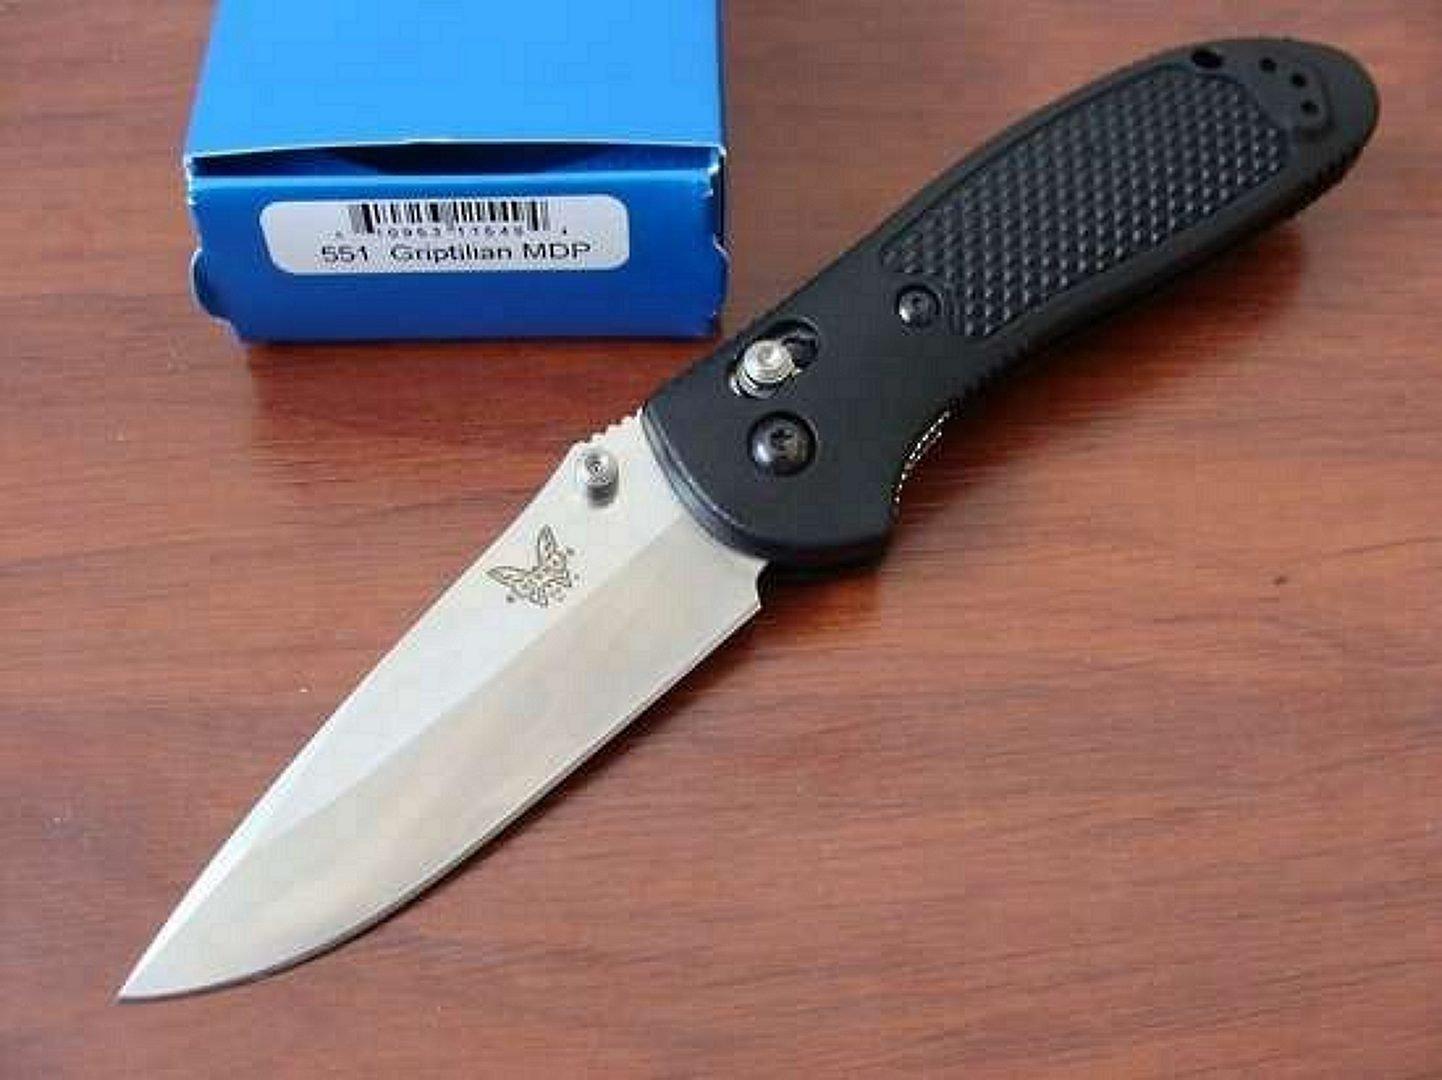 Benchmade GRIPTILIAN 551 Folding Knife